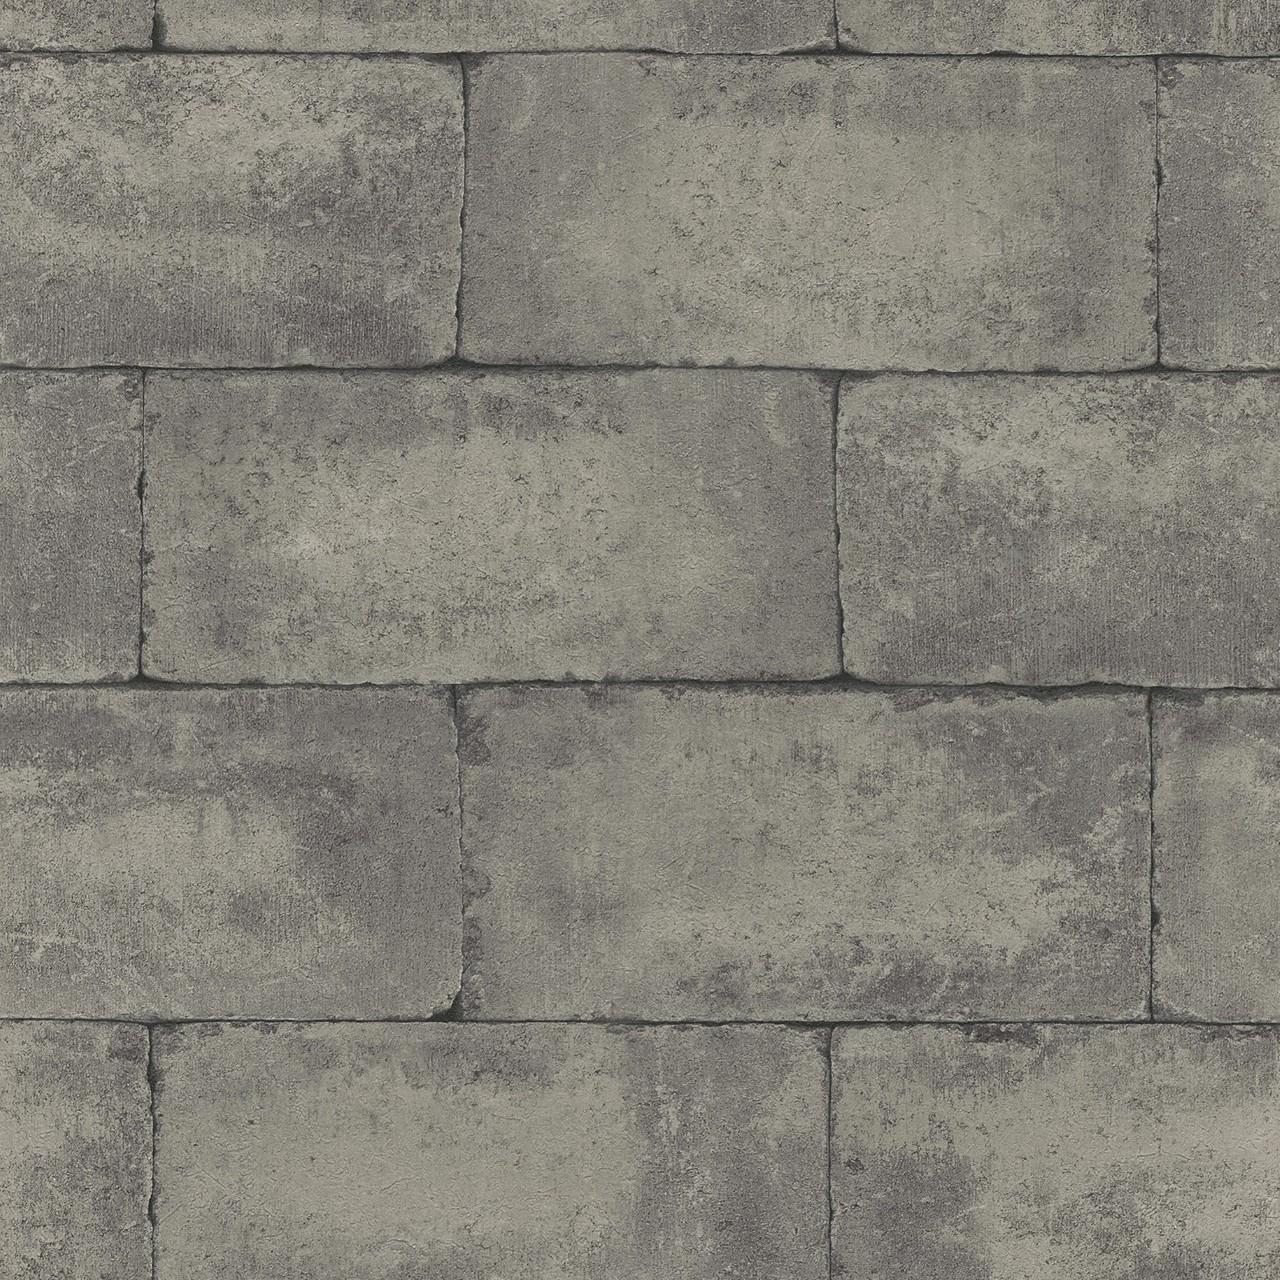 cinder block width wallpapers Car Pictures 1280x1280